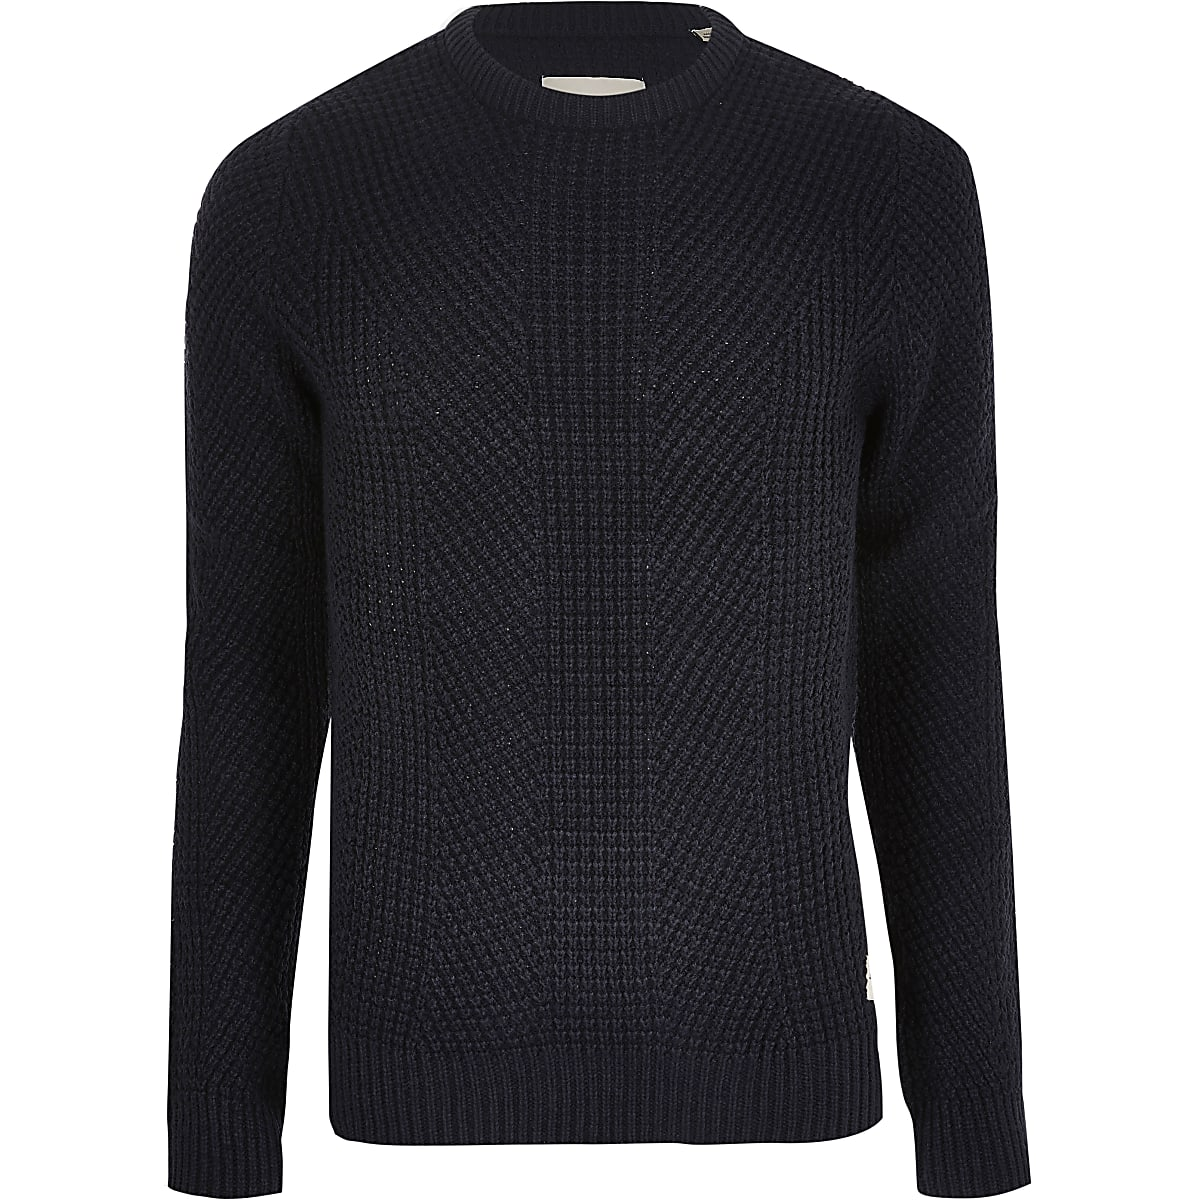 Jack and Jones navy knit jumper